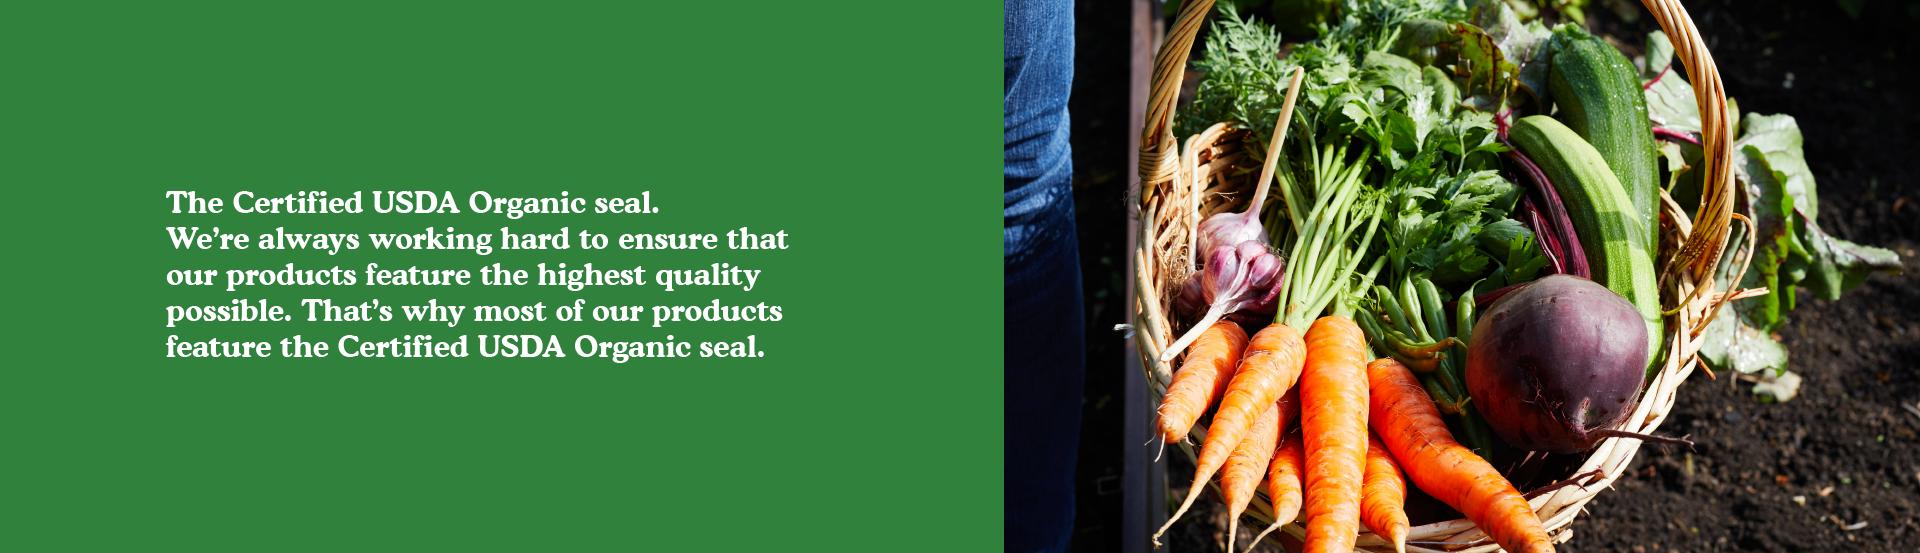 The certified USDA organic seal